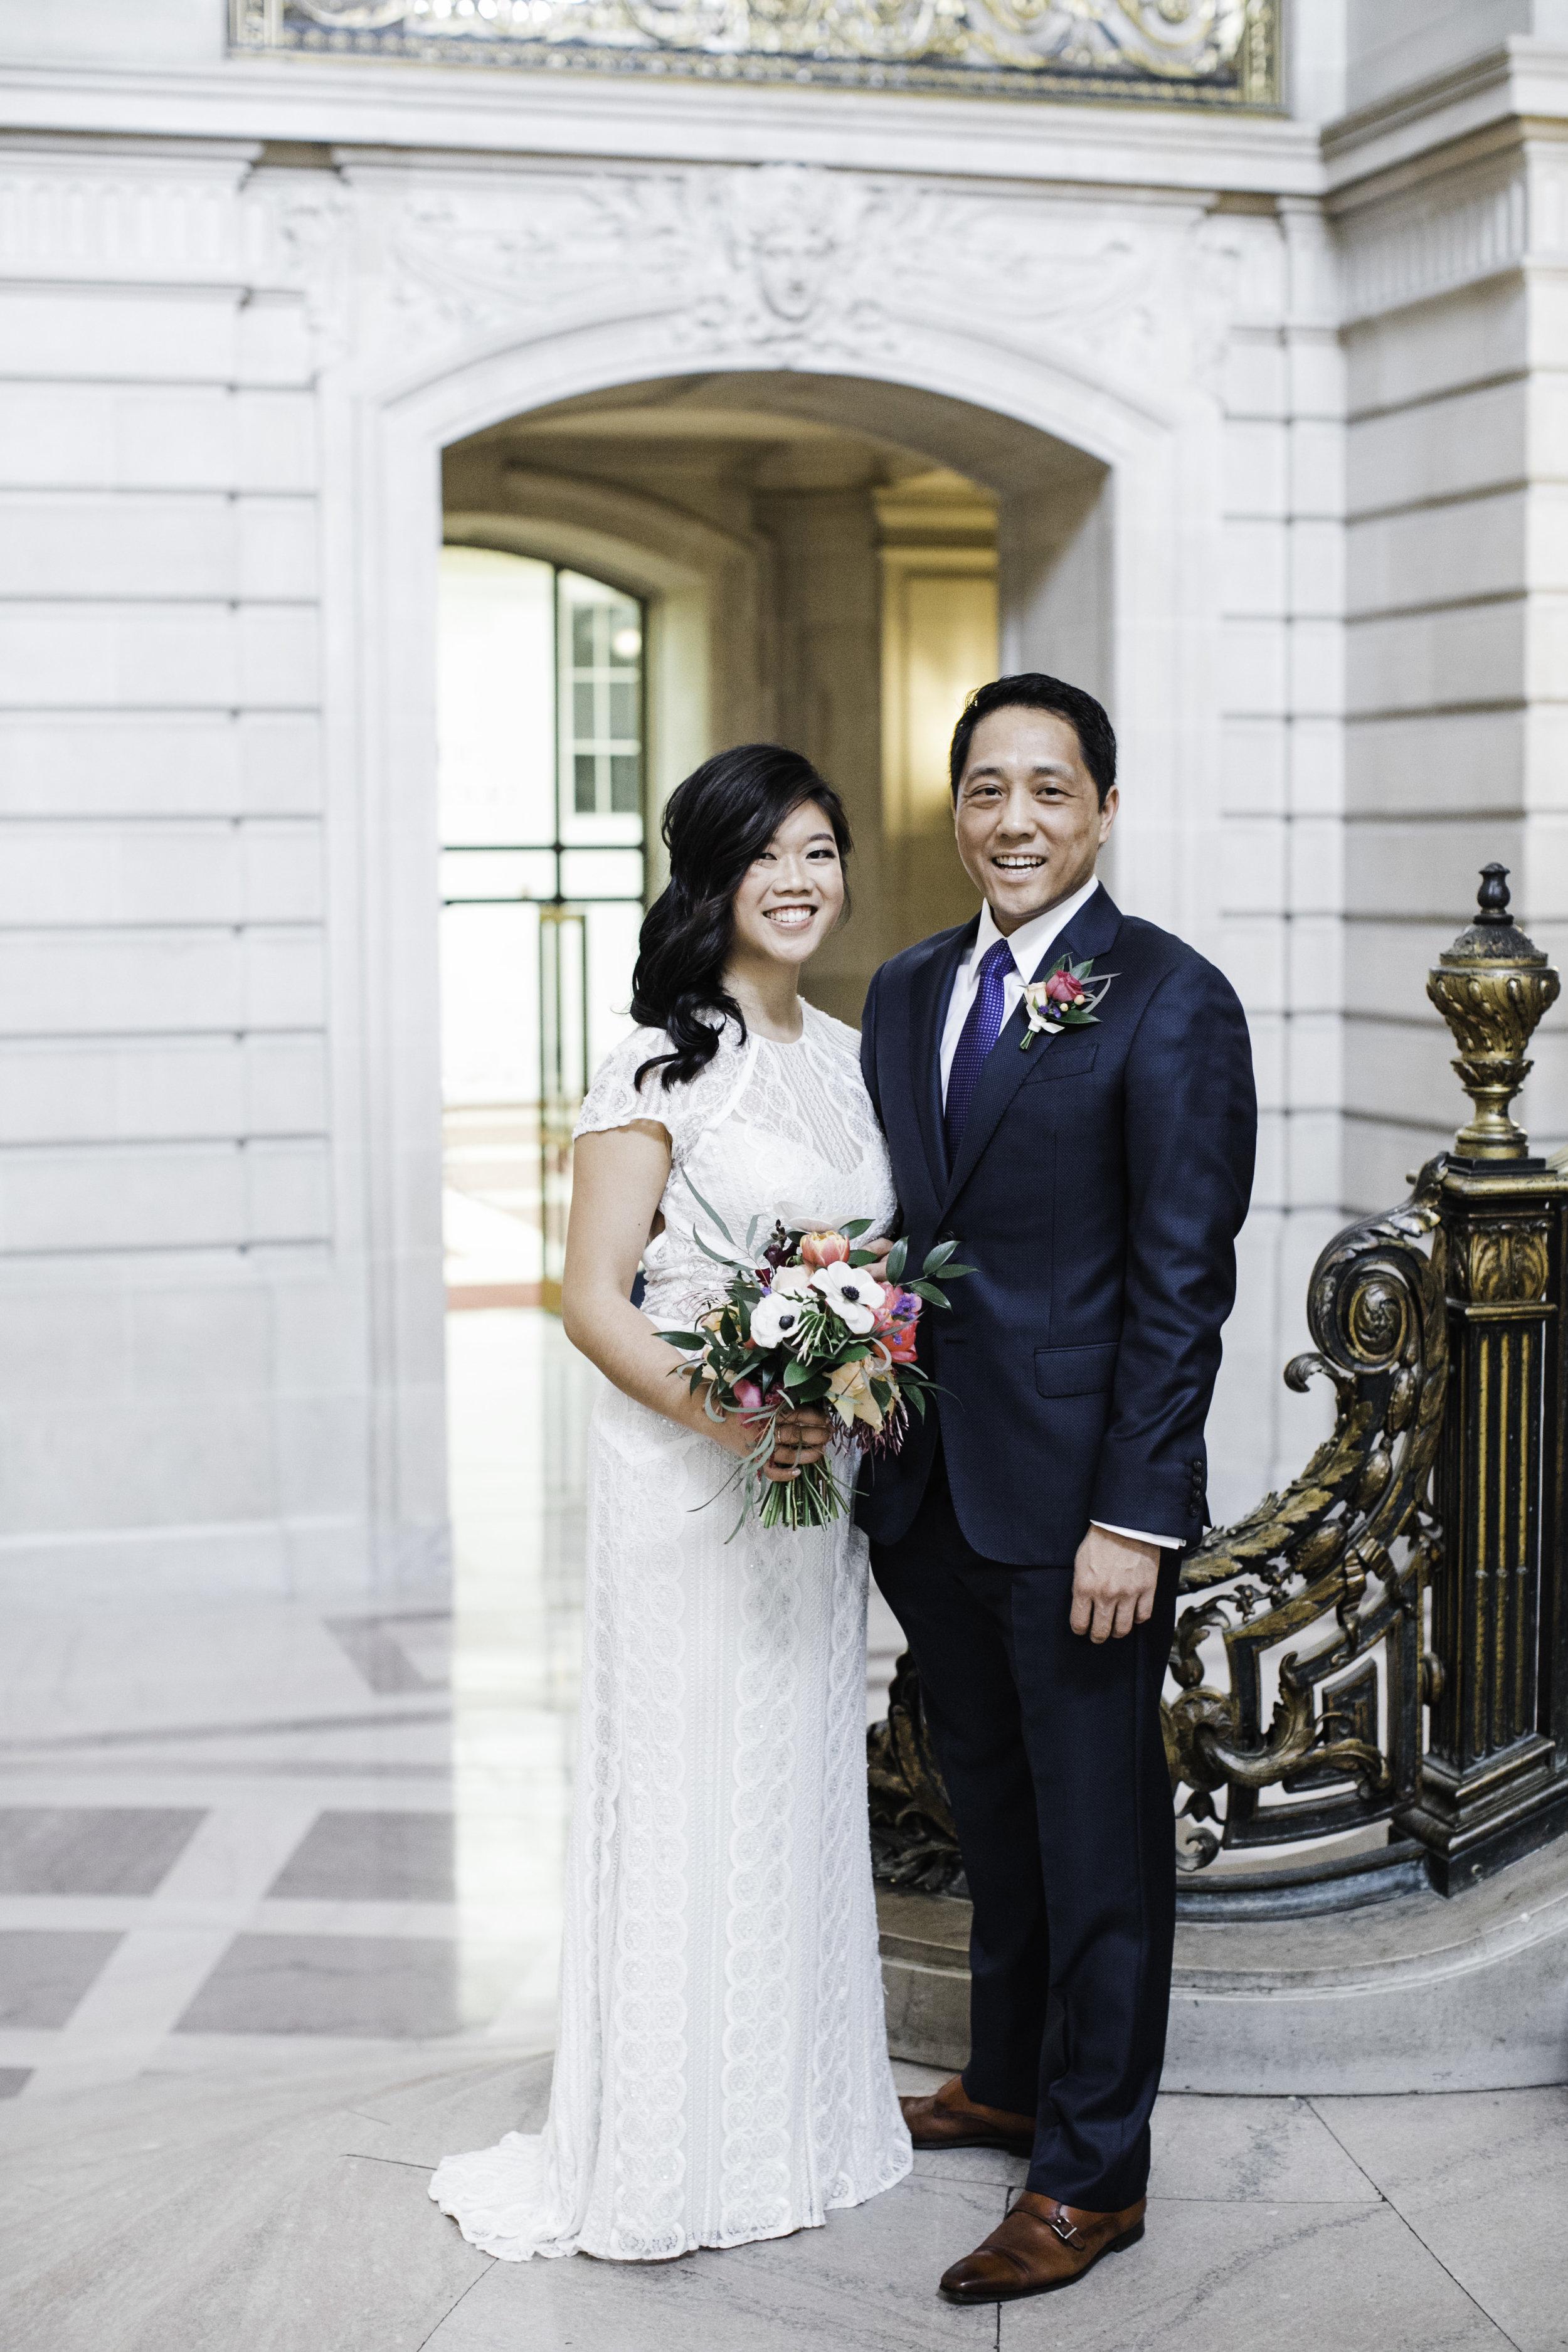 032118_M+D City Hall Wedding_Buena Lane Photography_0315-Edit-2.jpg